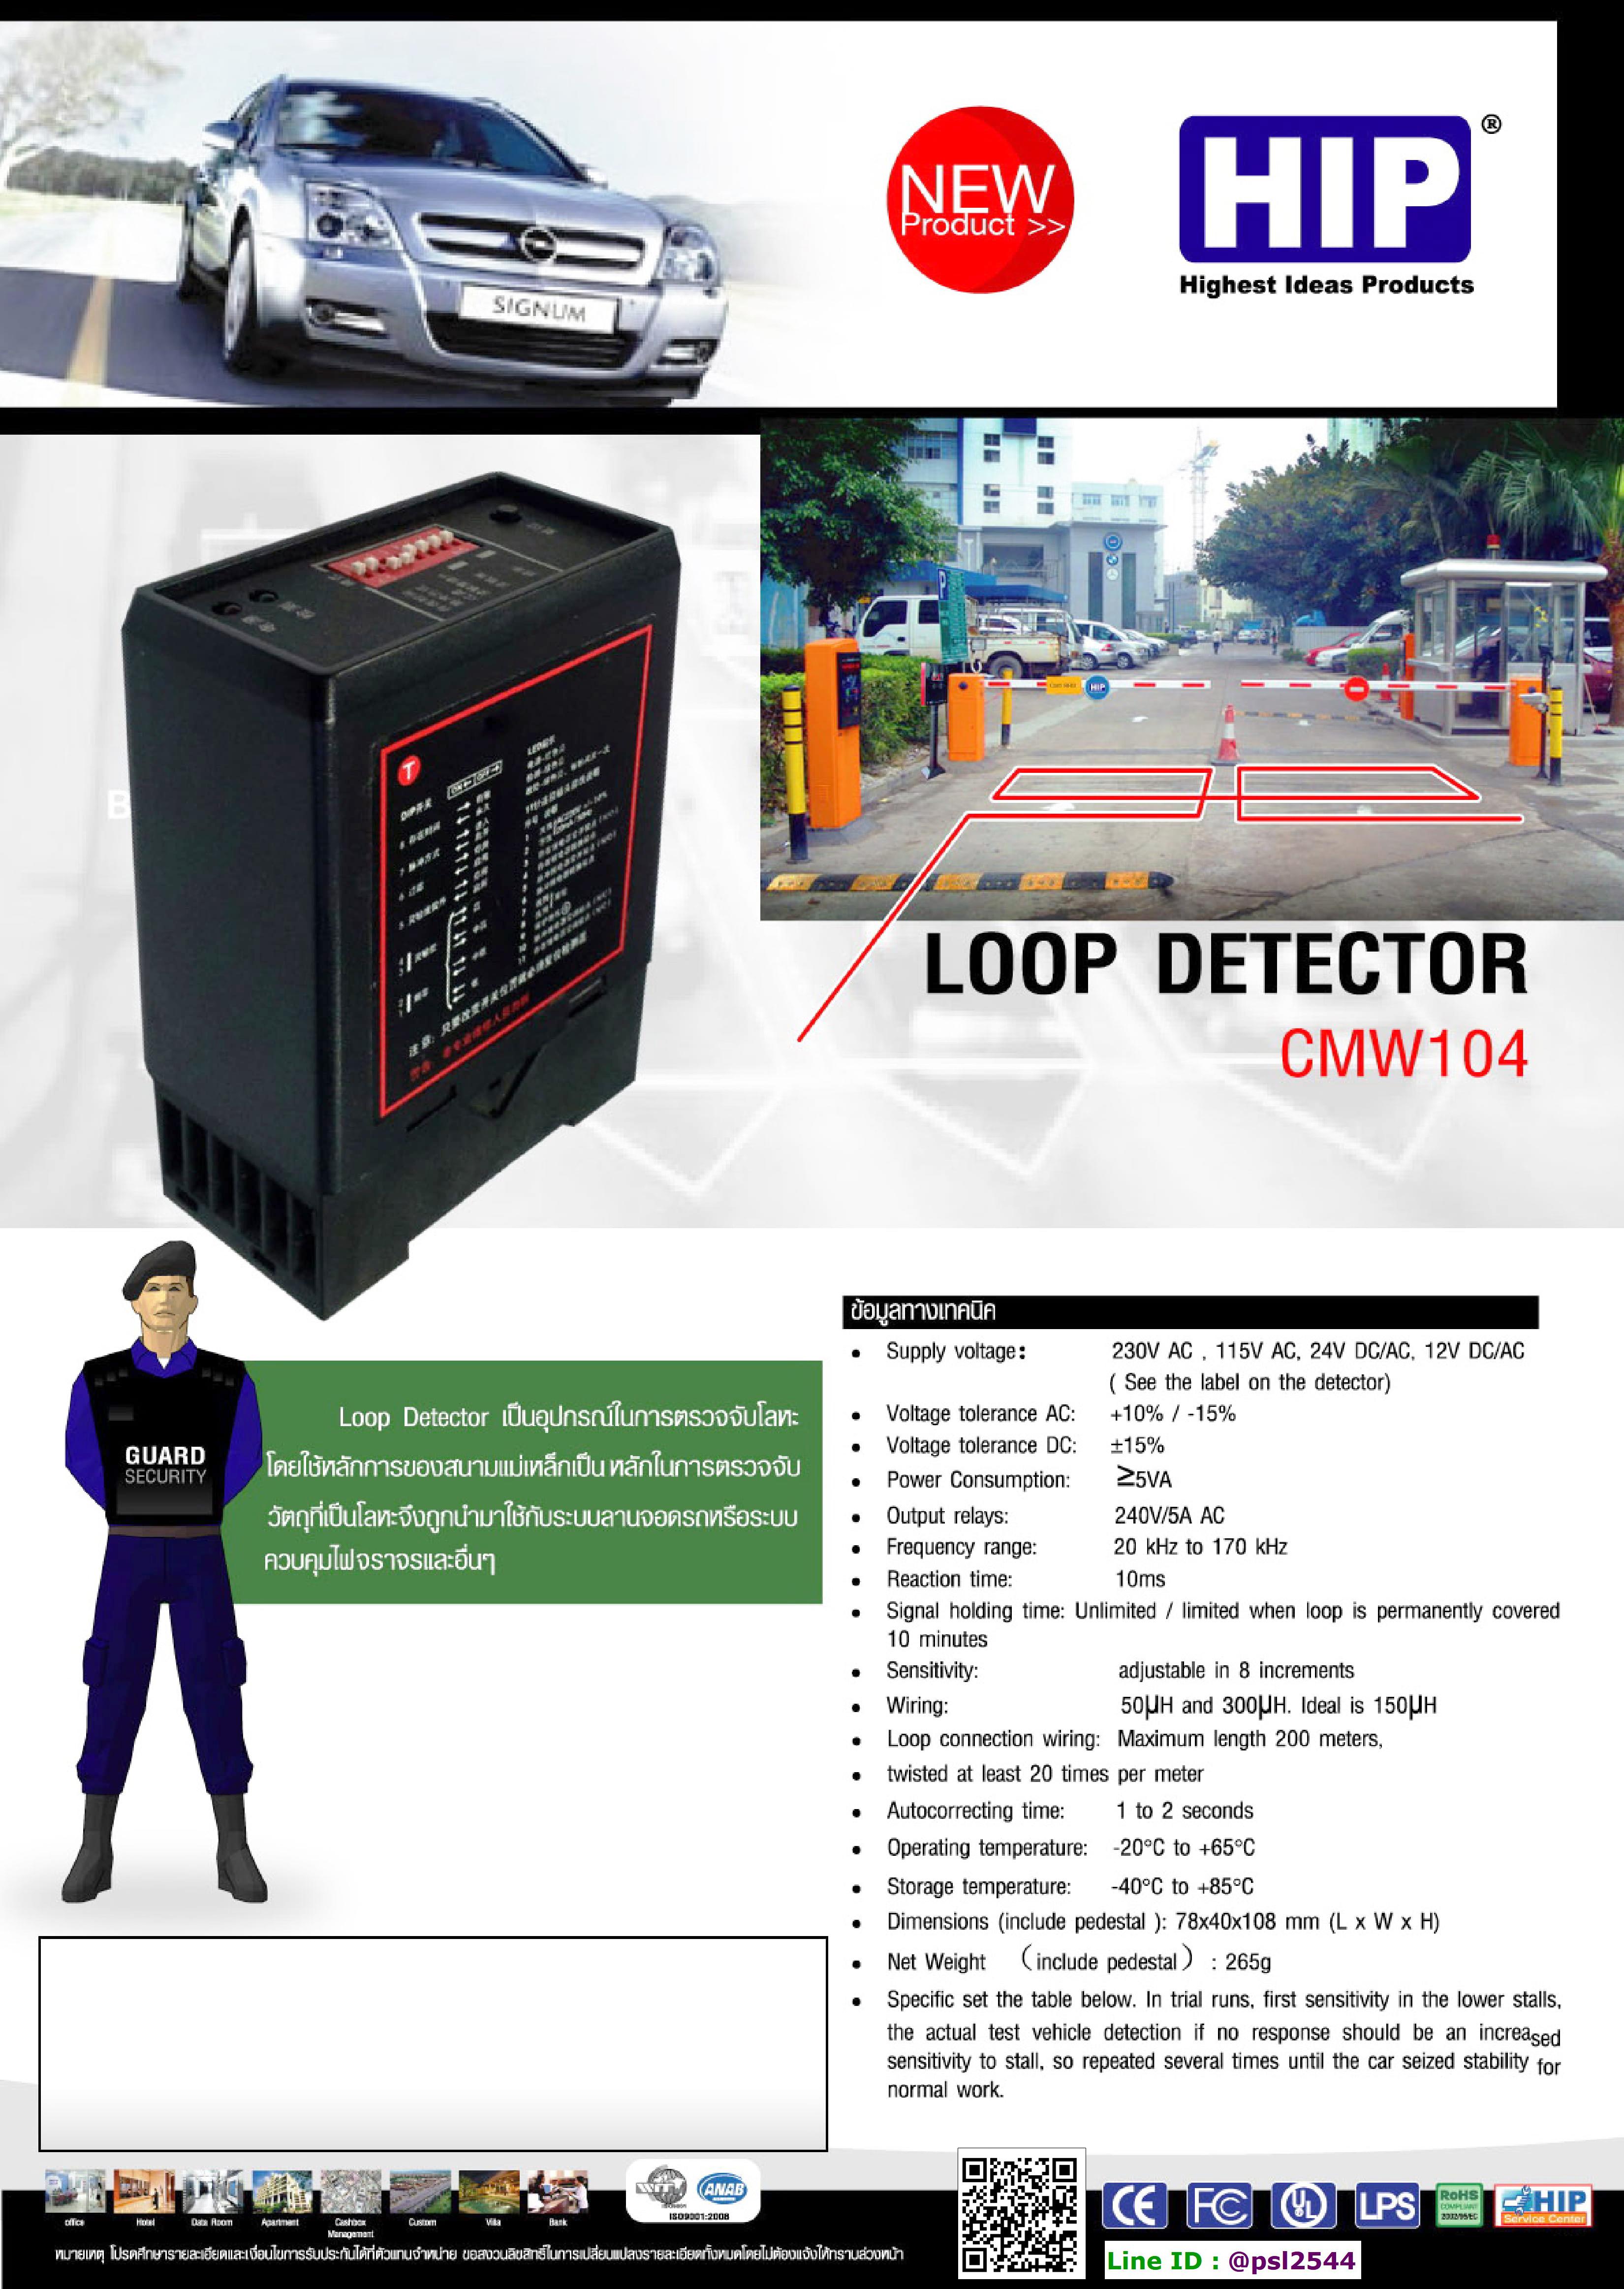 CMW104, Loop Detector, ป้องกันไม้ตีรถยนต์